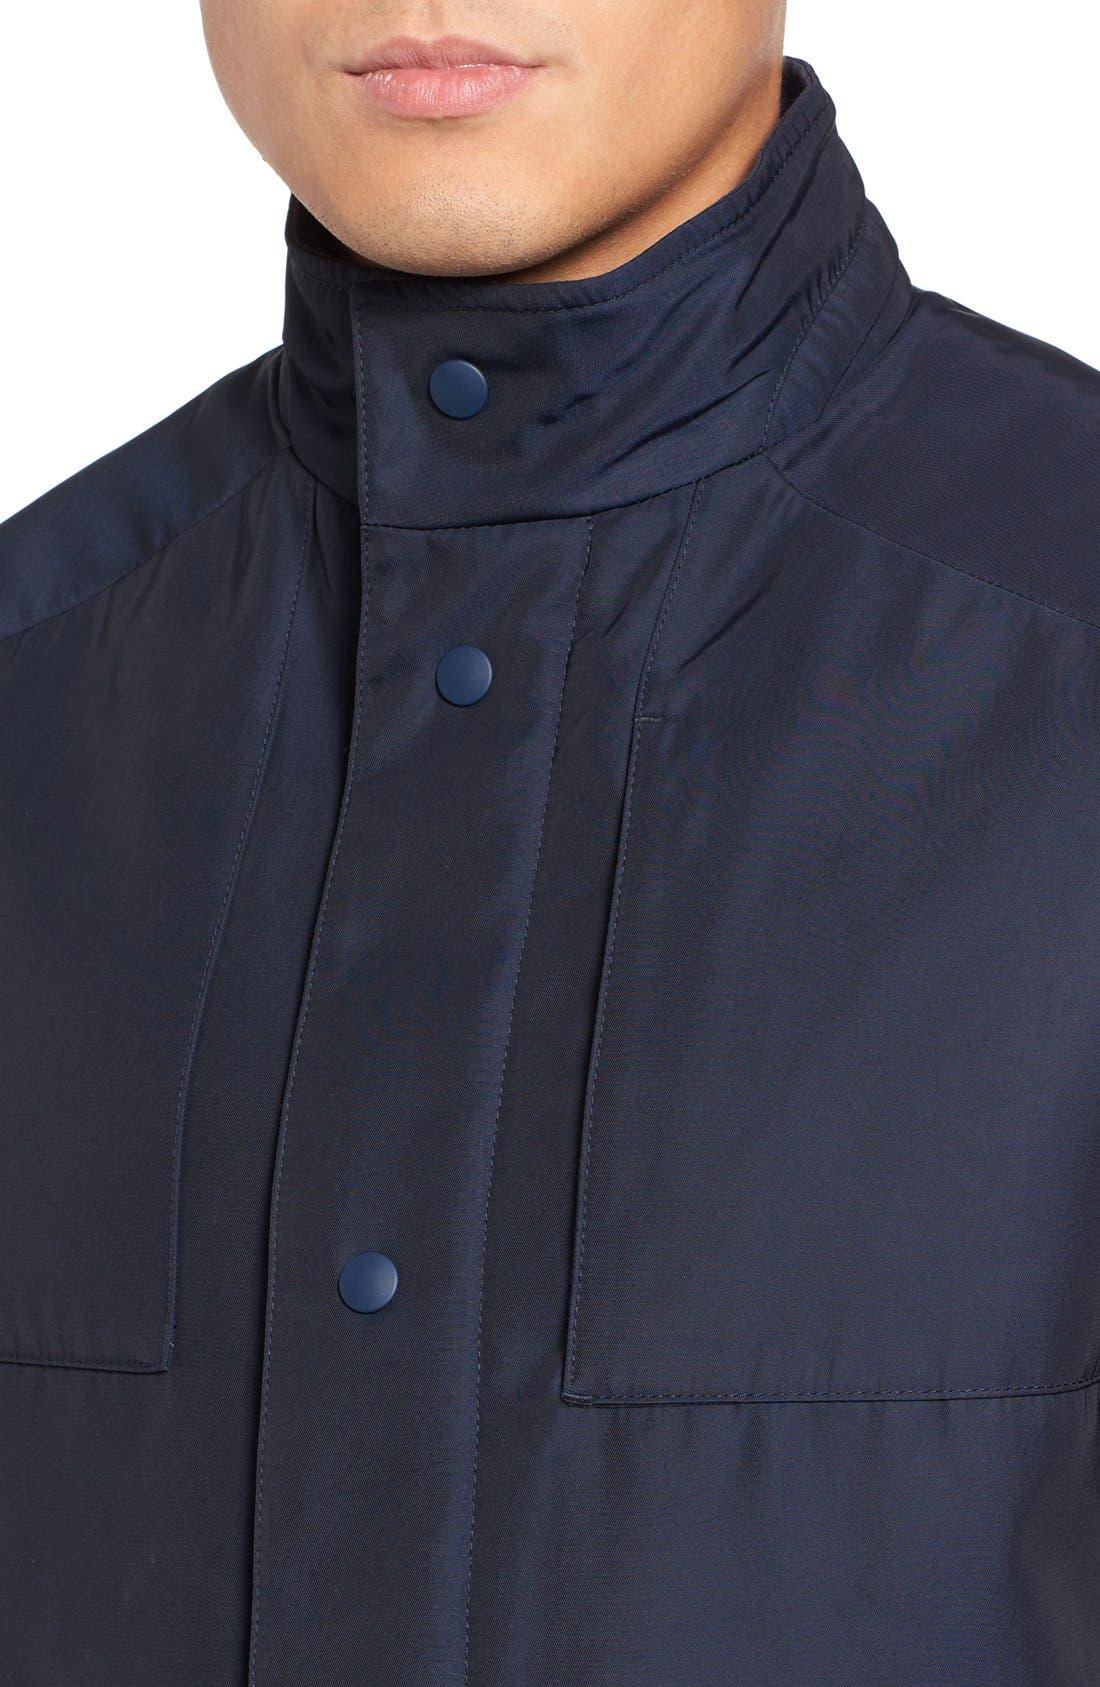 Lightweight Jacket,                             Alternate thumbnail 4, color,                             400